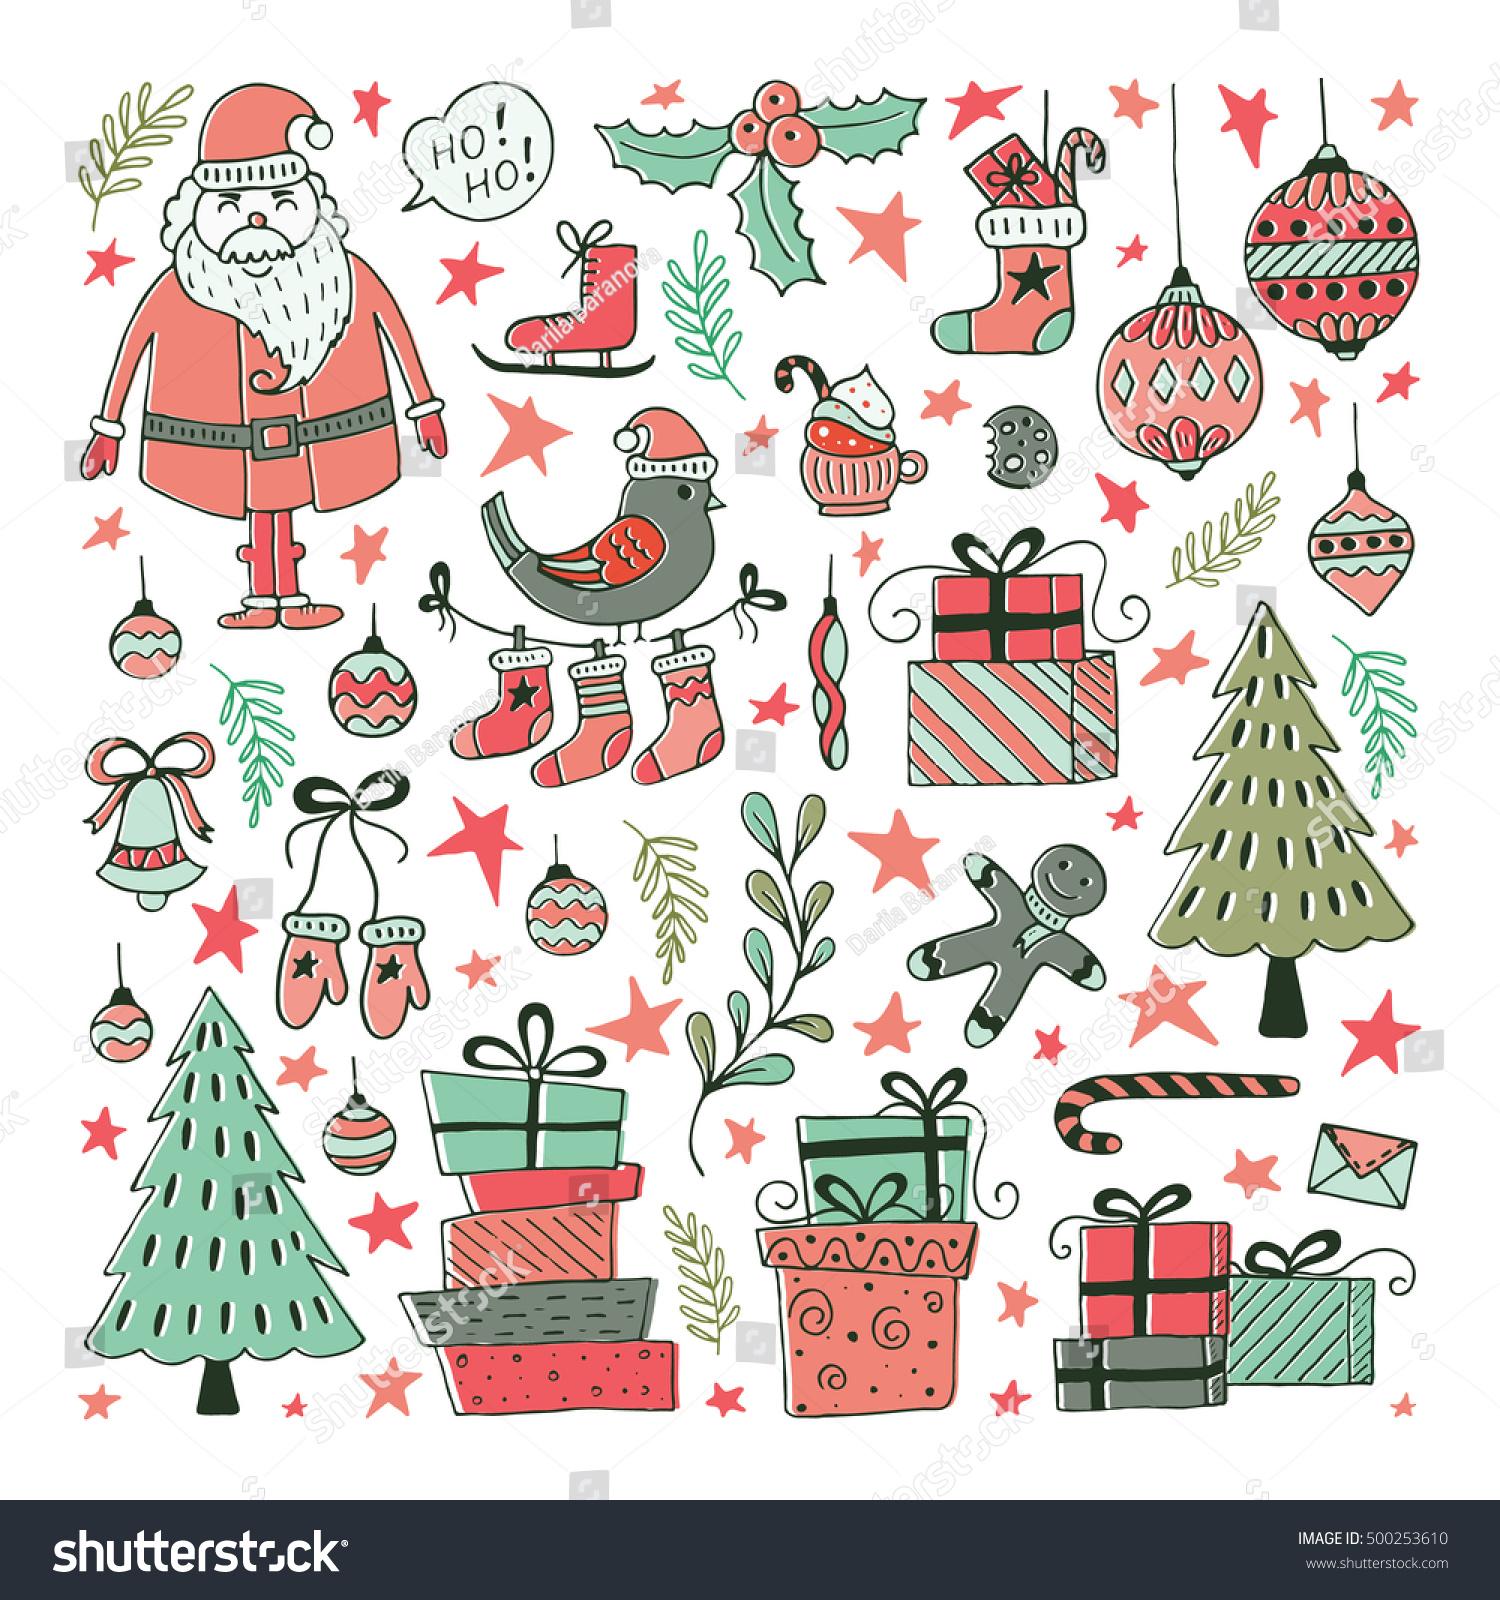 Vector Set Hand Drawn Christmas Illustrations Stock-Vektorgrafik ...